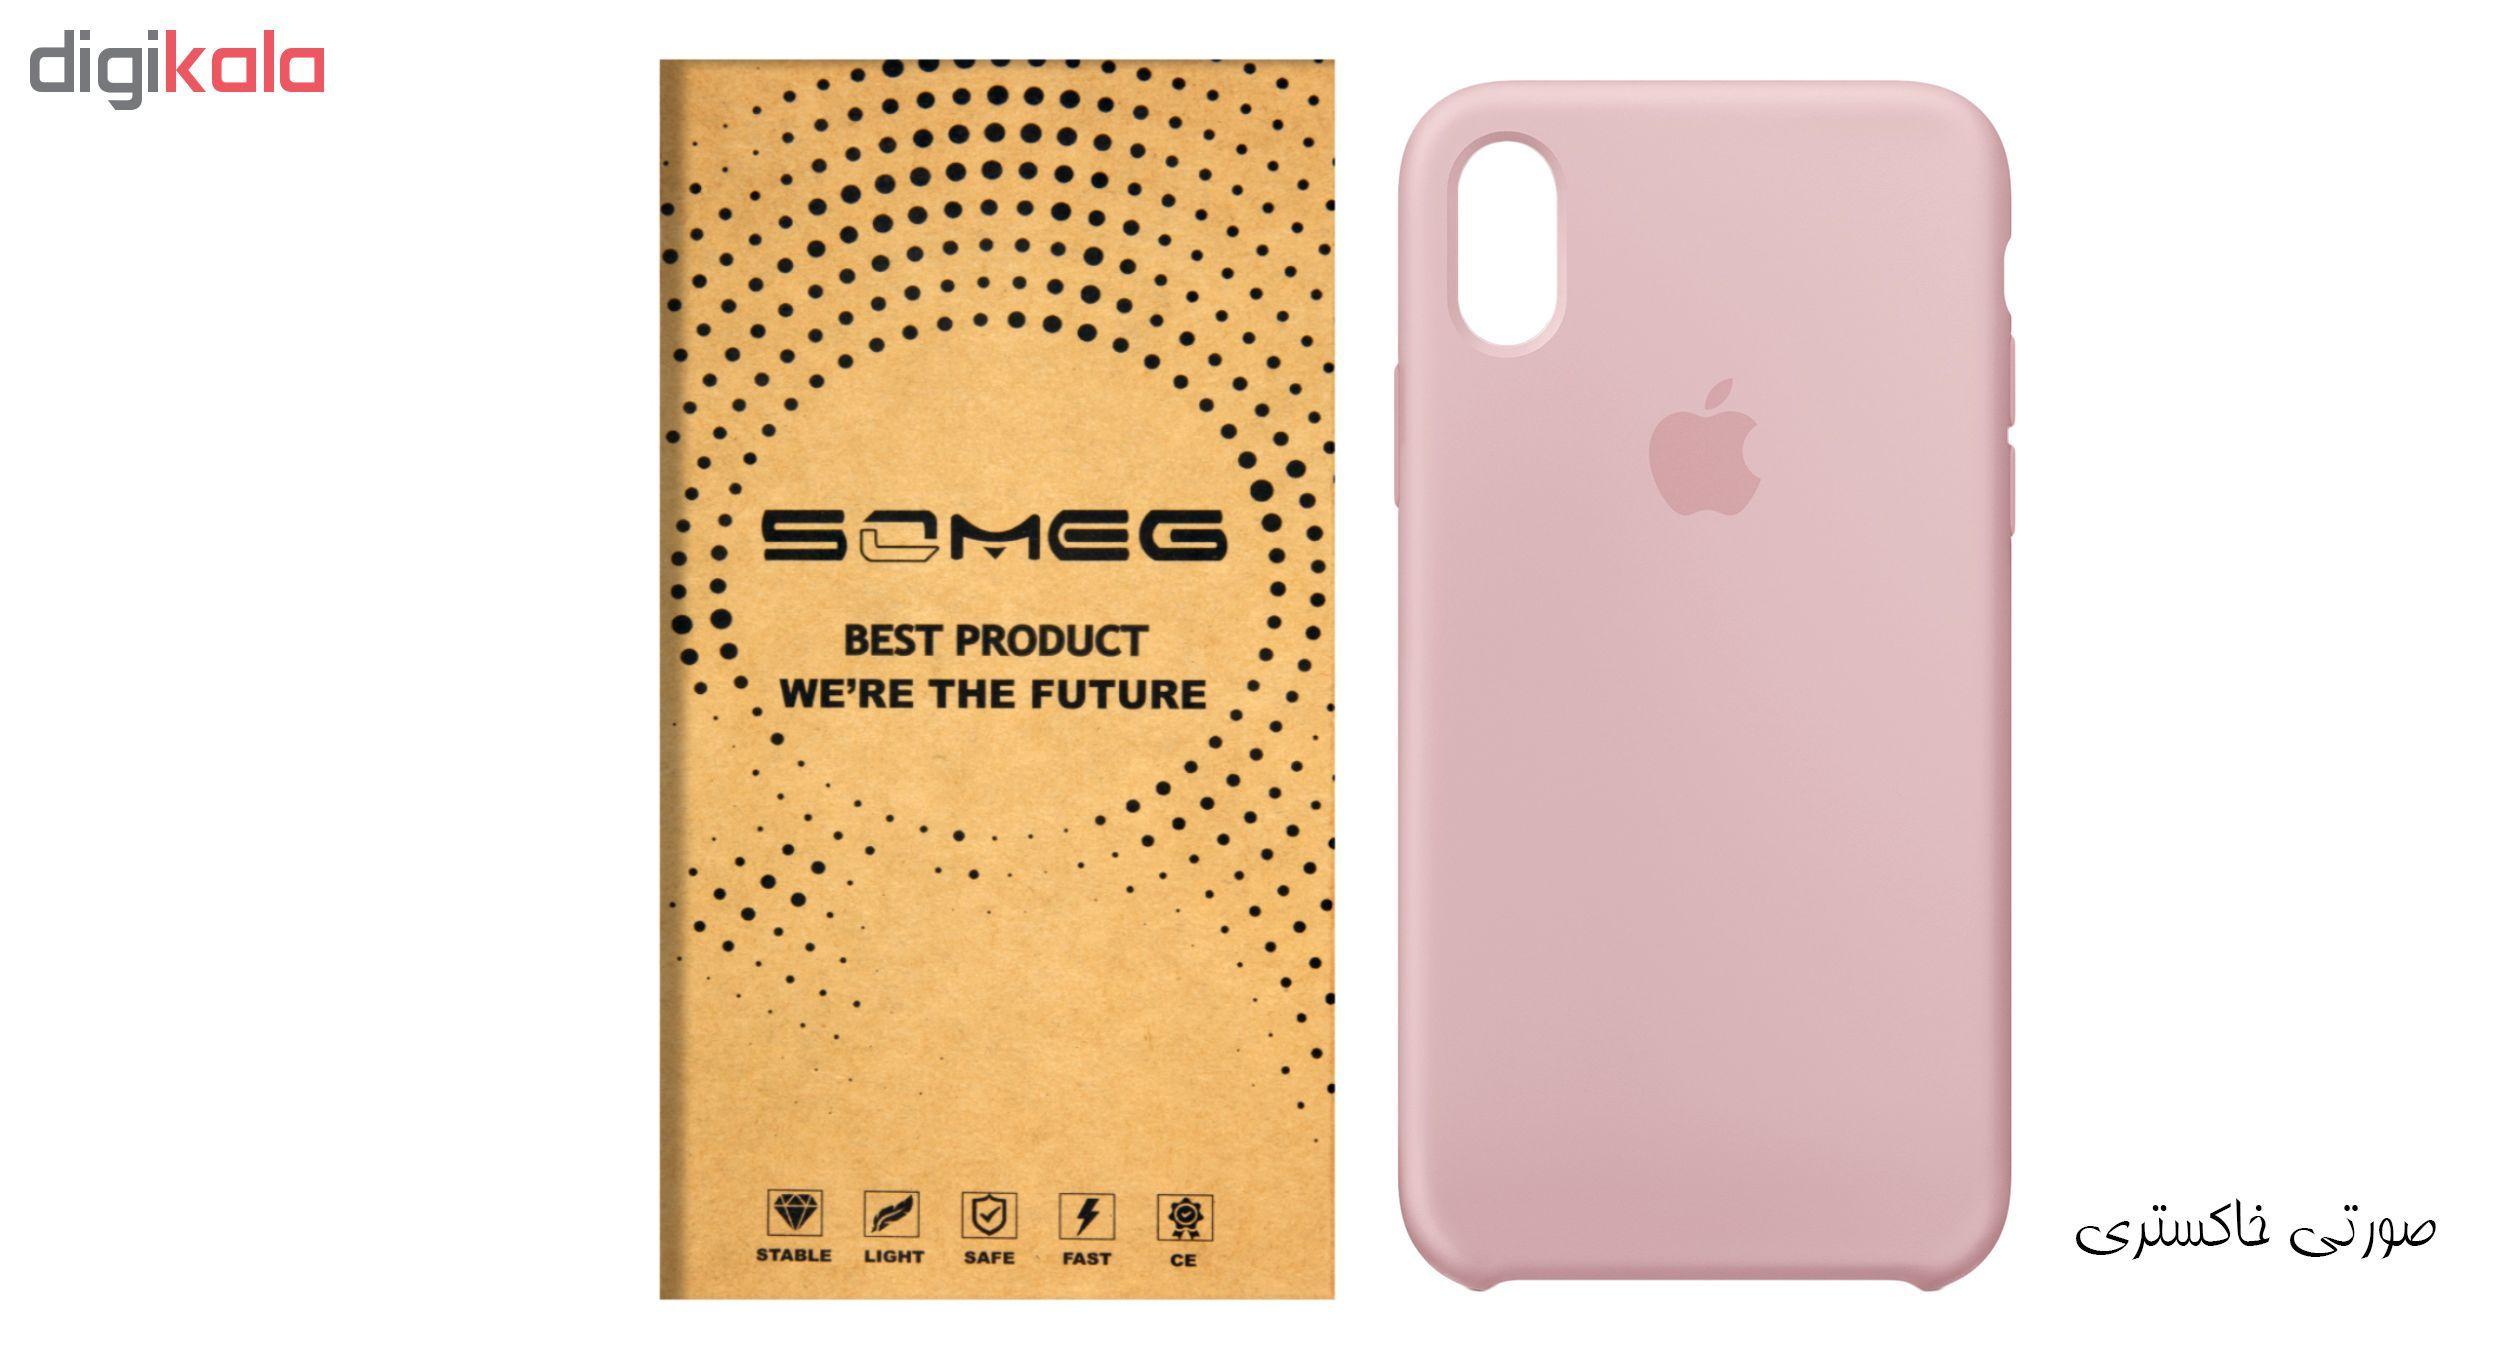 کاور سومگ مدل SIC مناسب برای گوشی موبایل اپل iPhone X  main 1 17